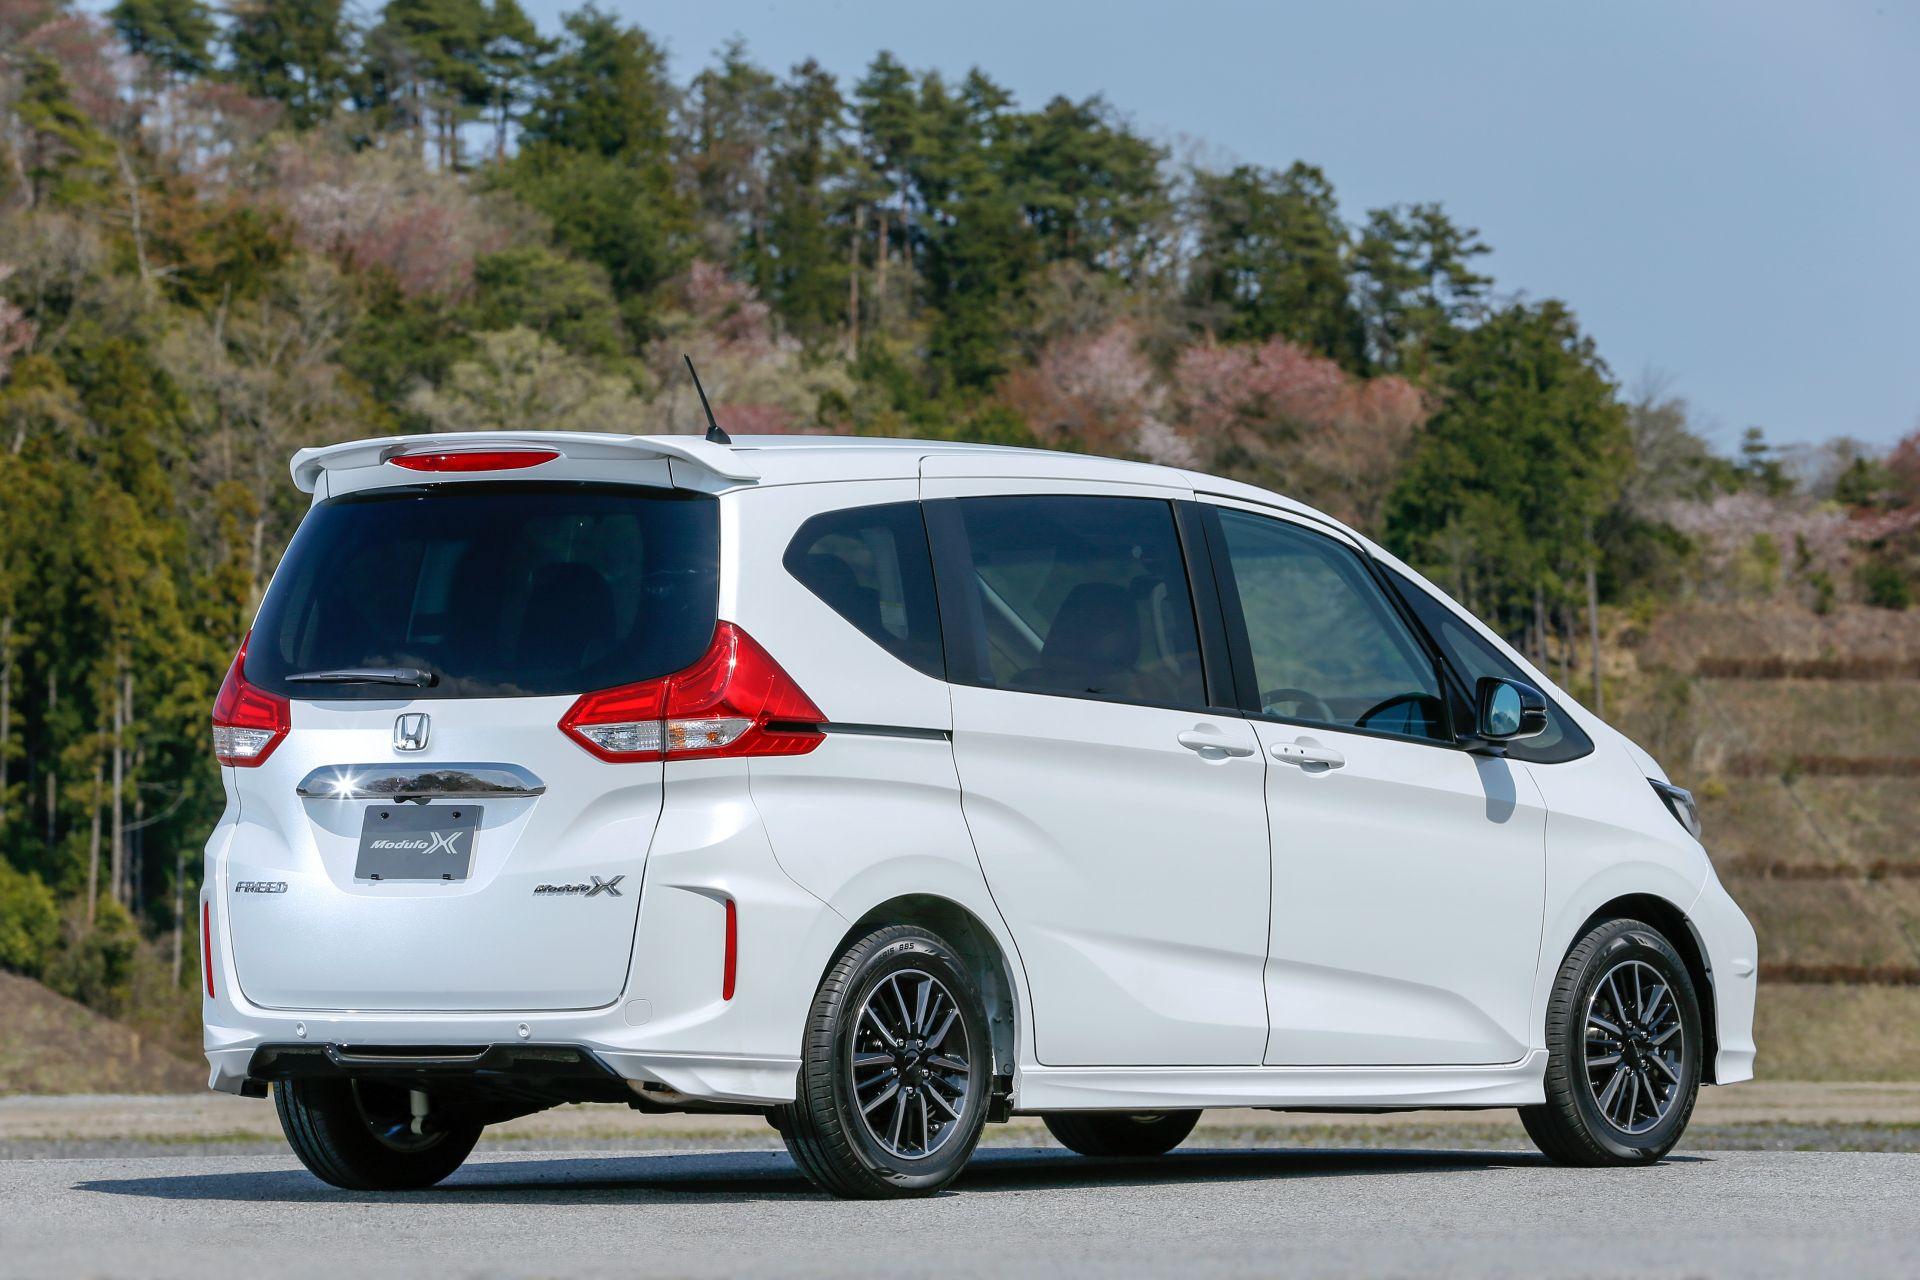 Honda-Freed-Modulo-X-Facelift-2020-13